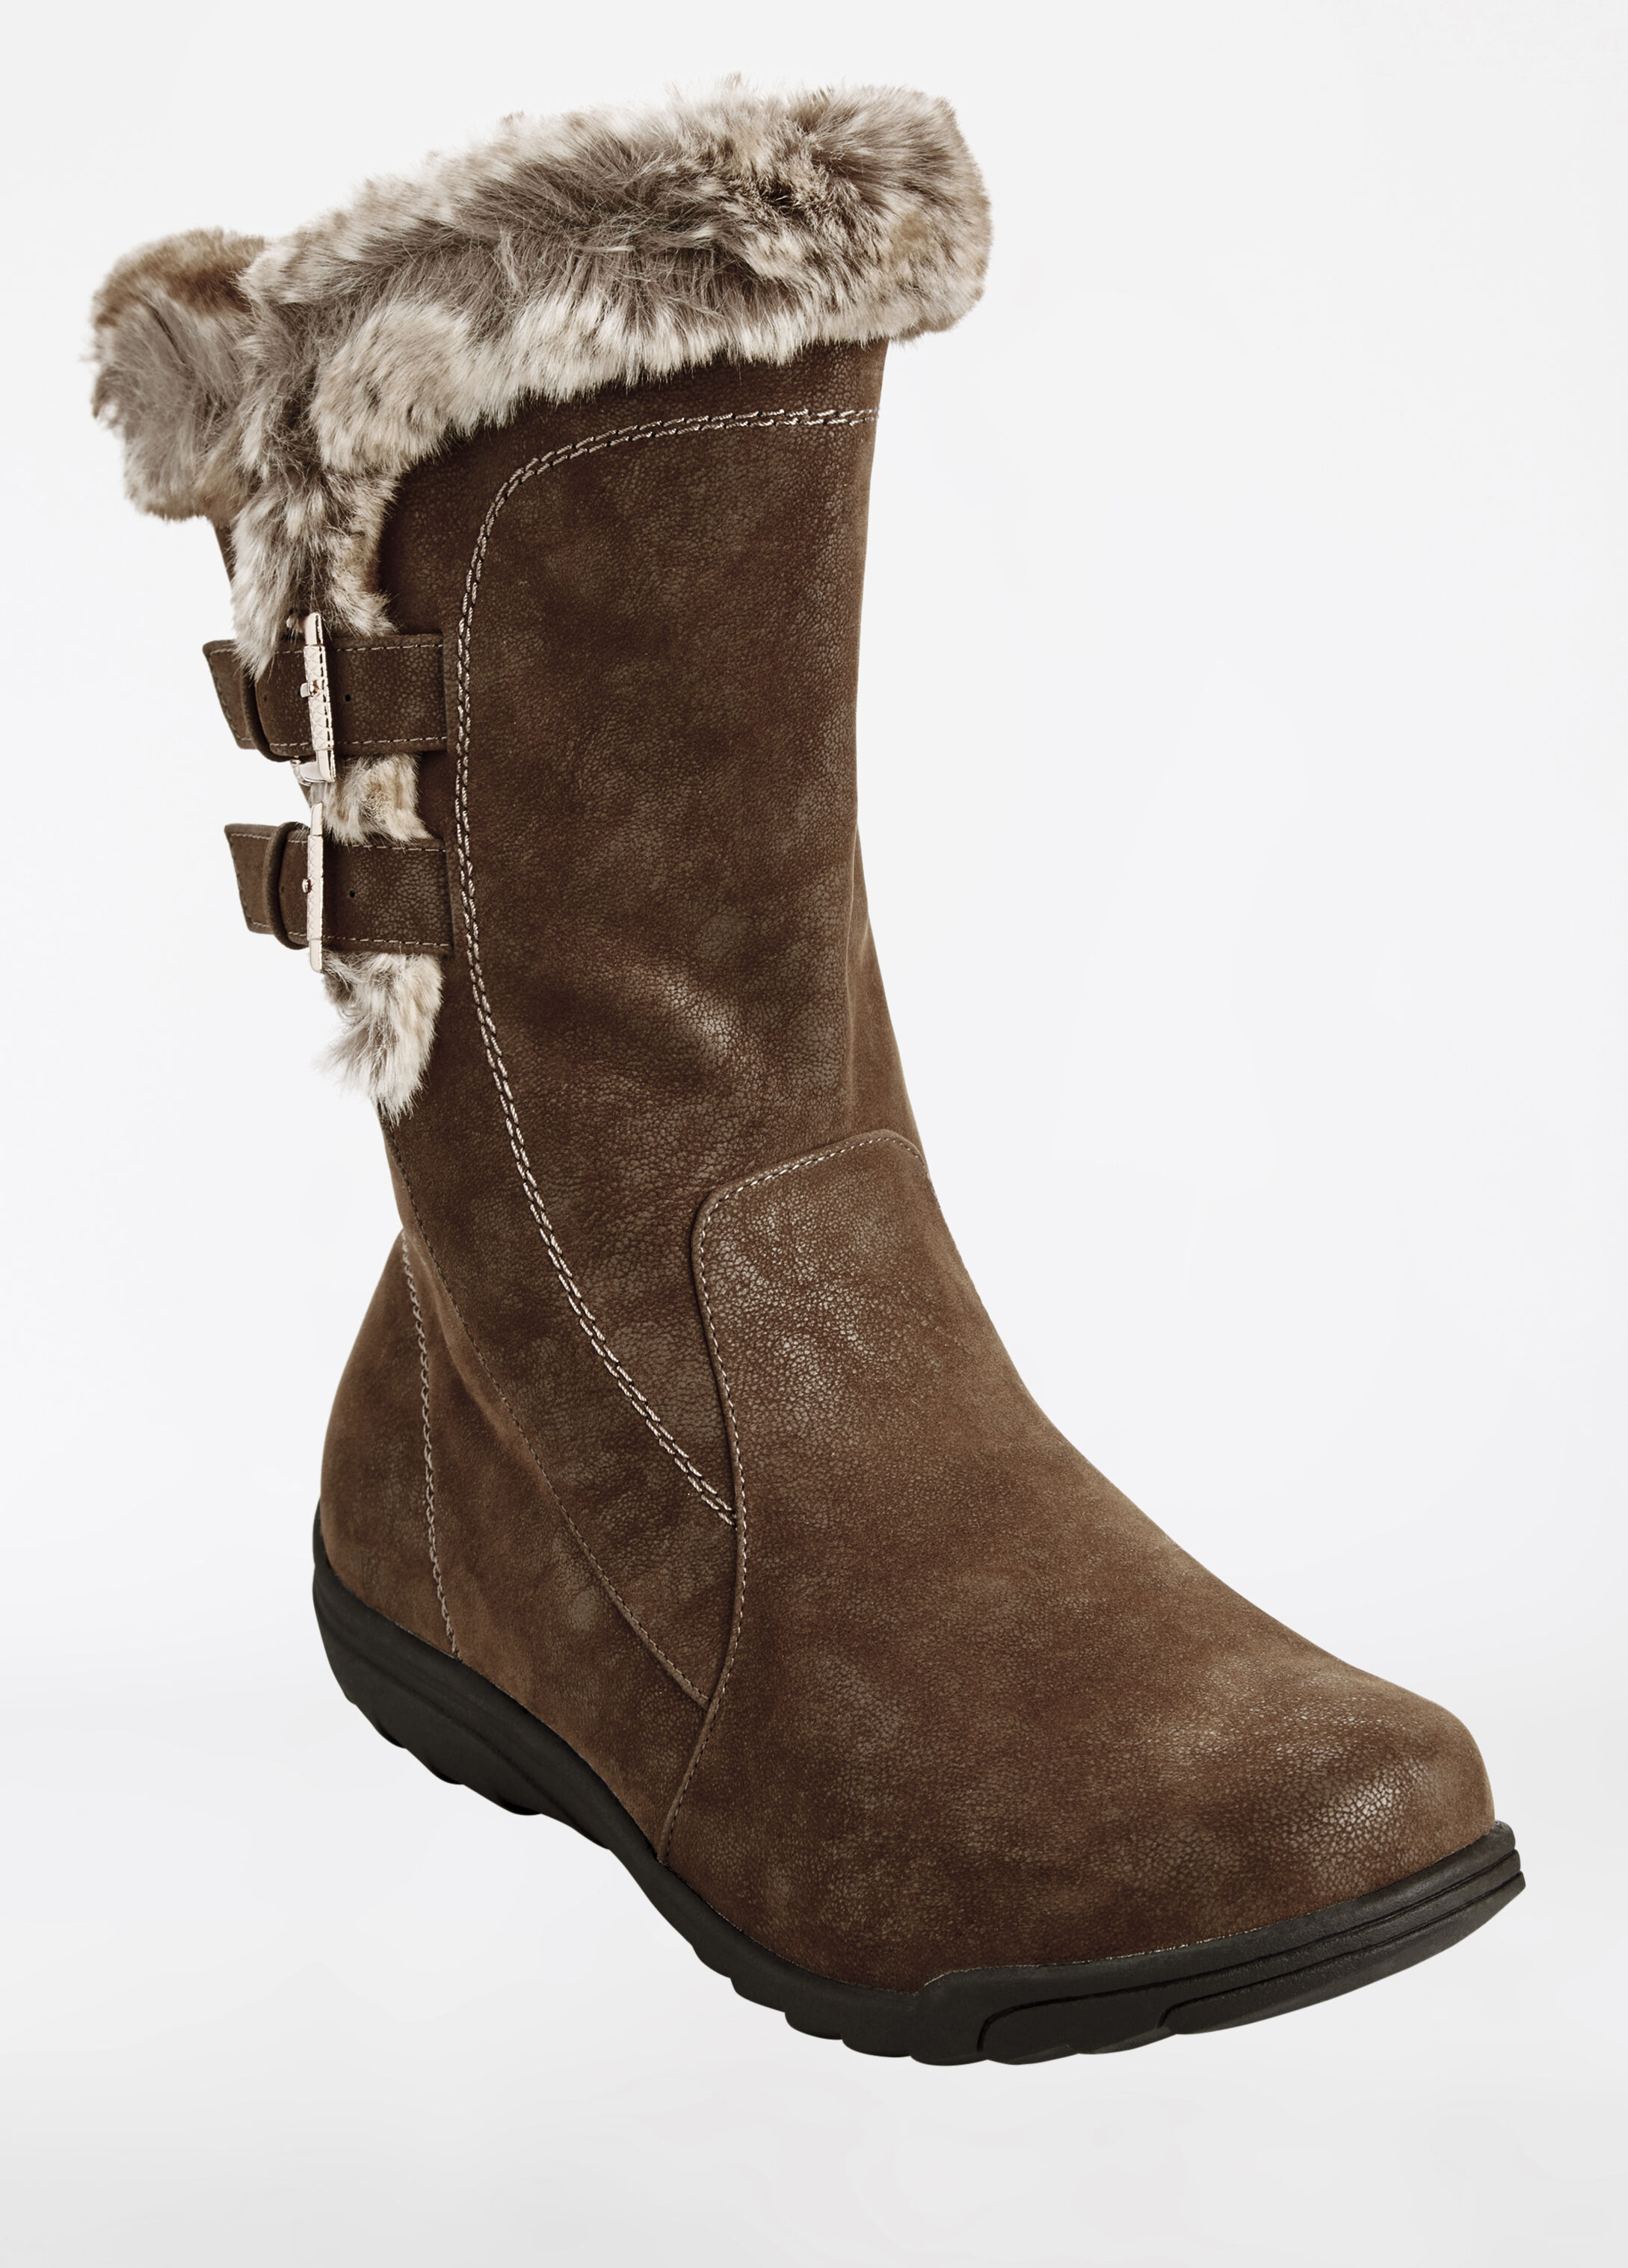 Faux Fur Lined Short Boot - Wide Width